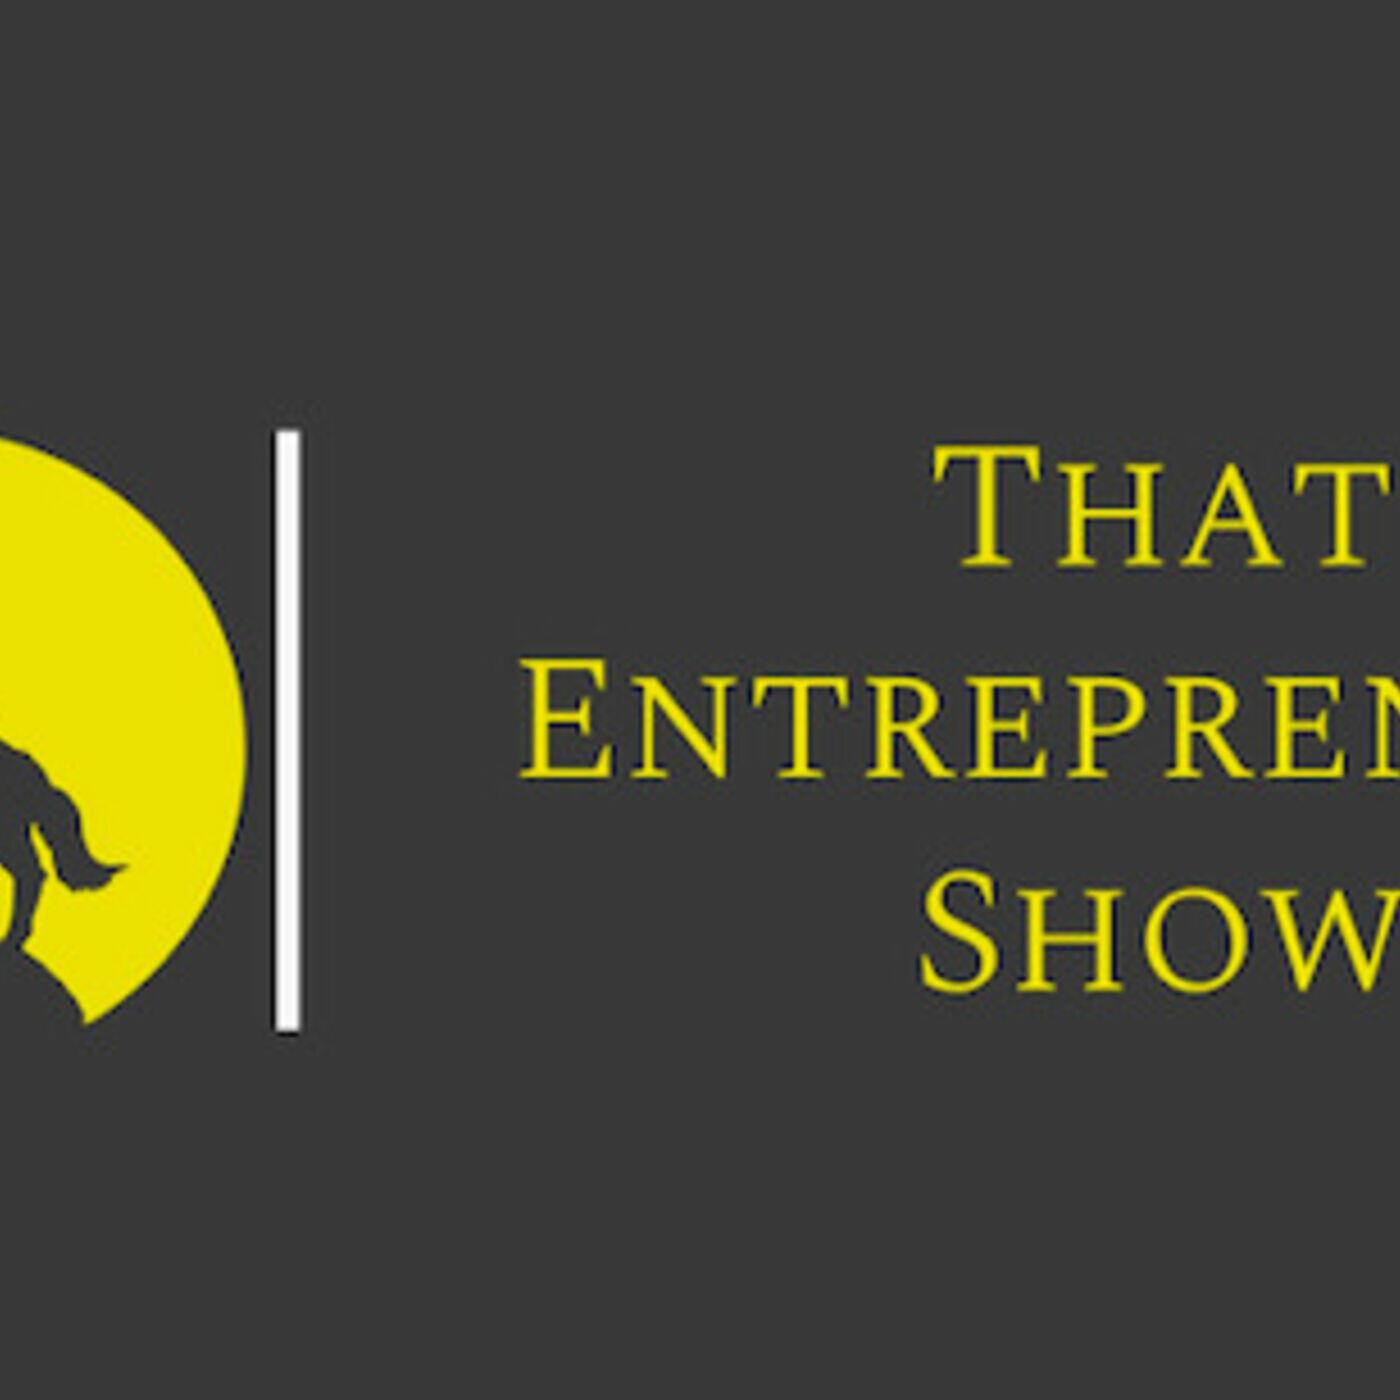 That Entrepreneur Show